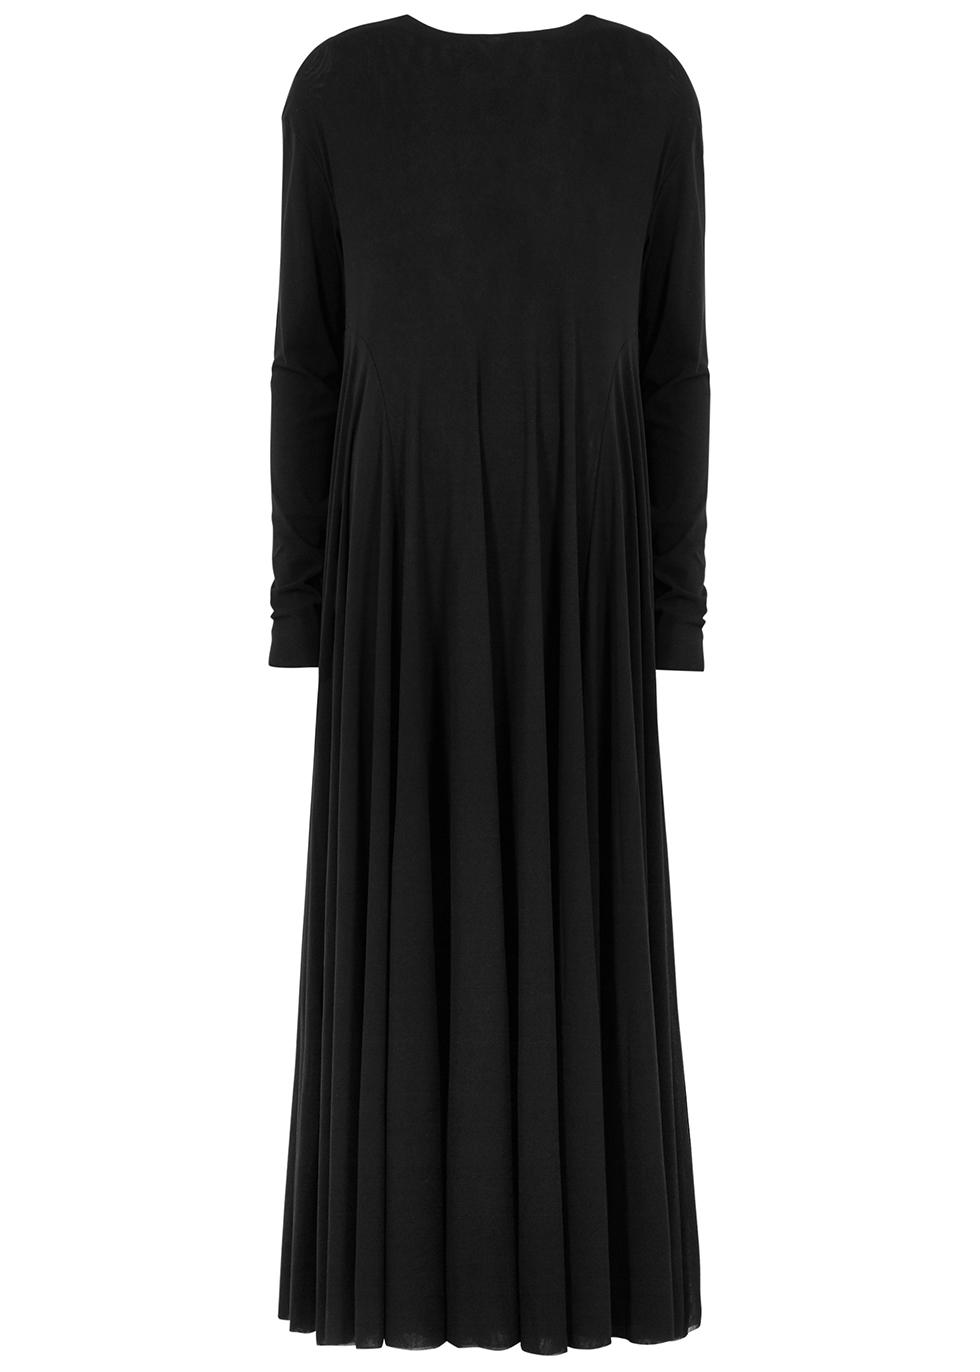 9b3f699e Designer Dresses & Designer Gowns - Harvey Nichols